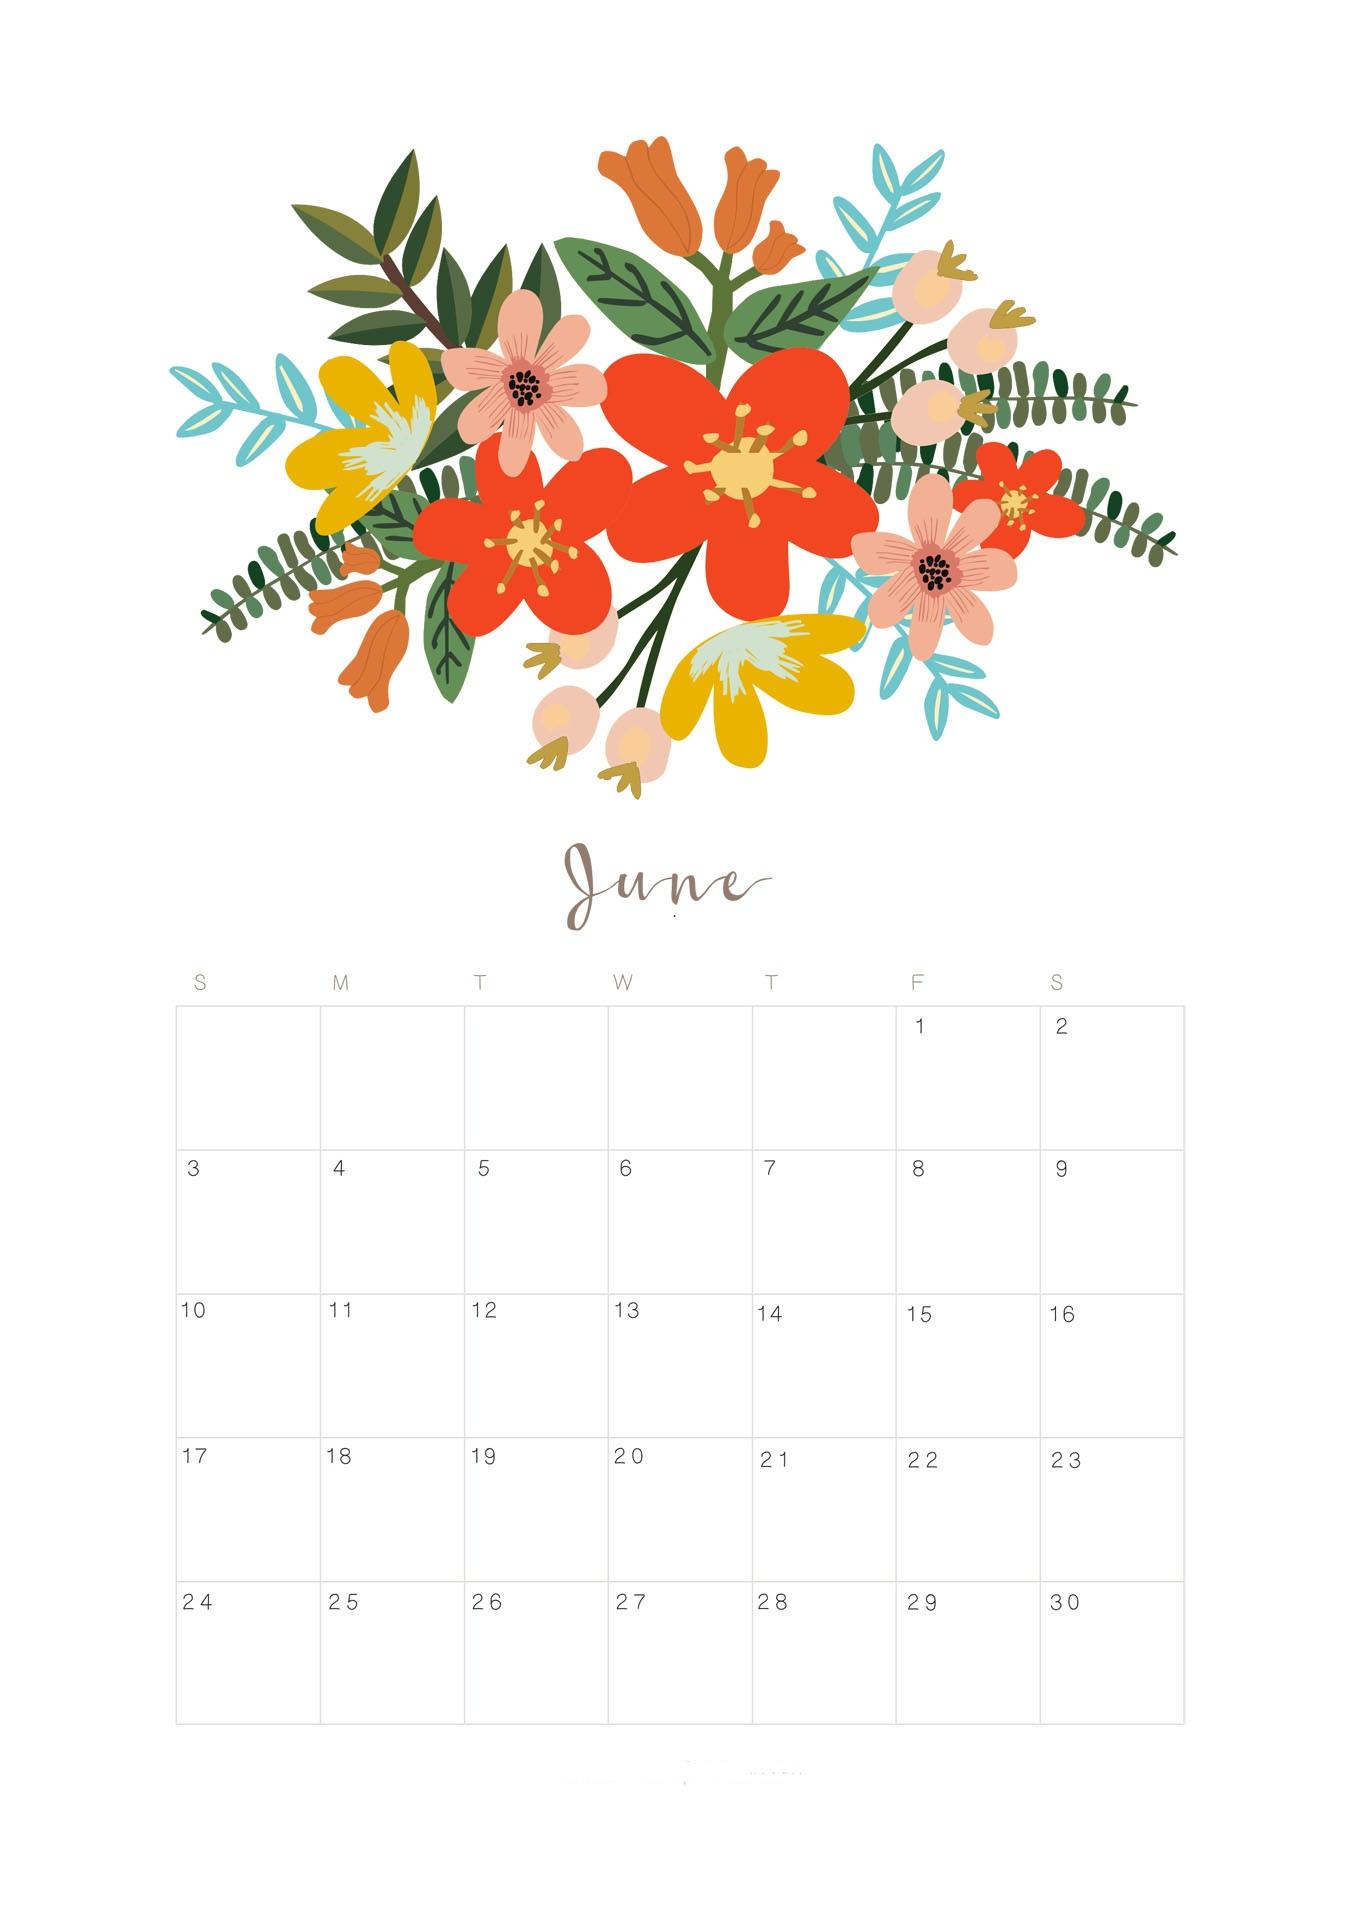 June 2018 Calendar Australia - Free Printable Template throughout Calendar June Template Australia